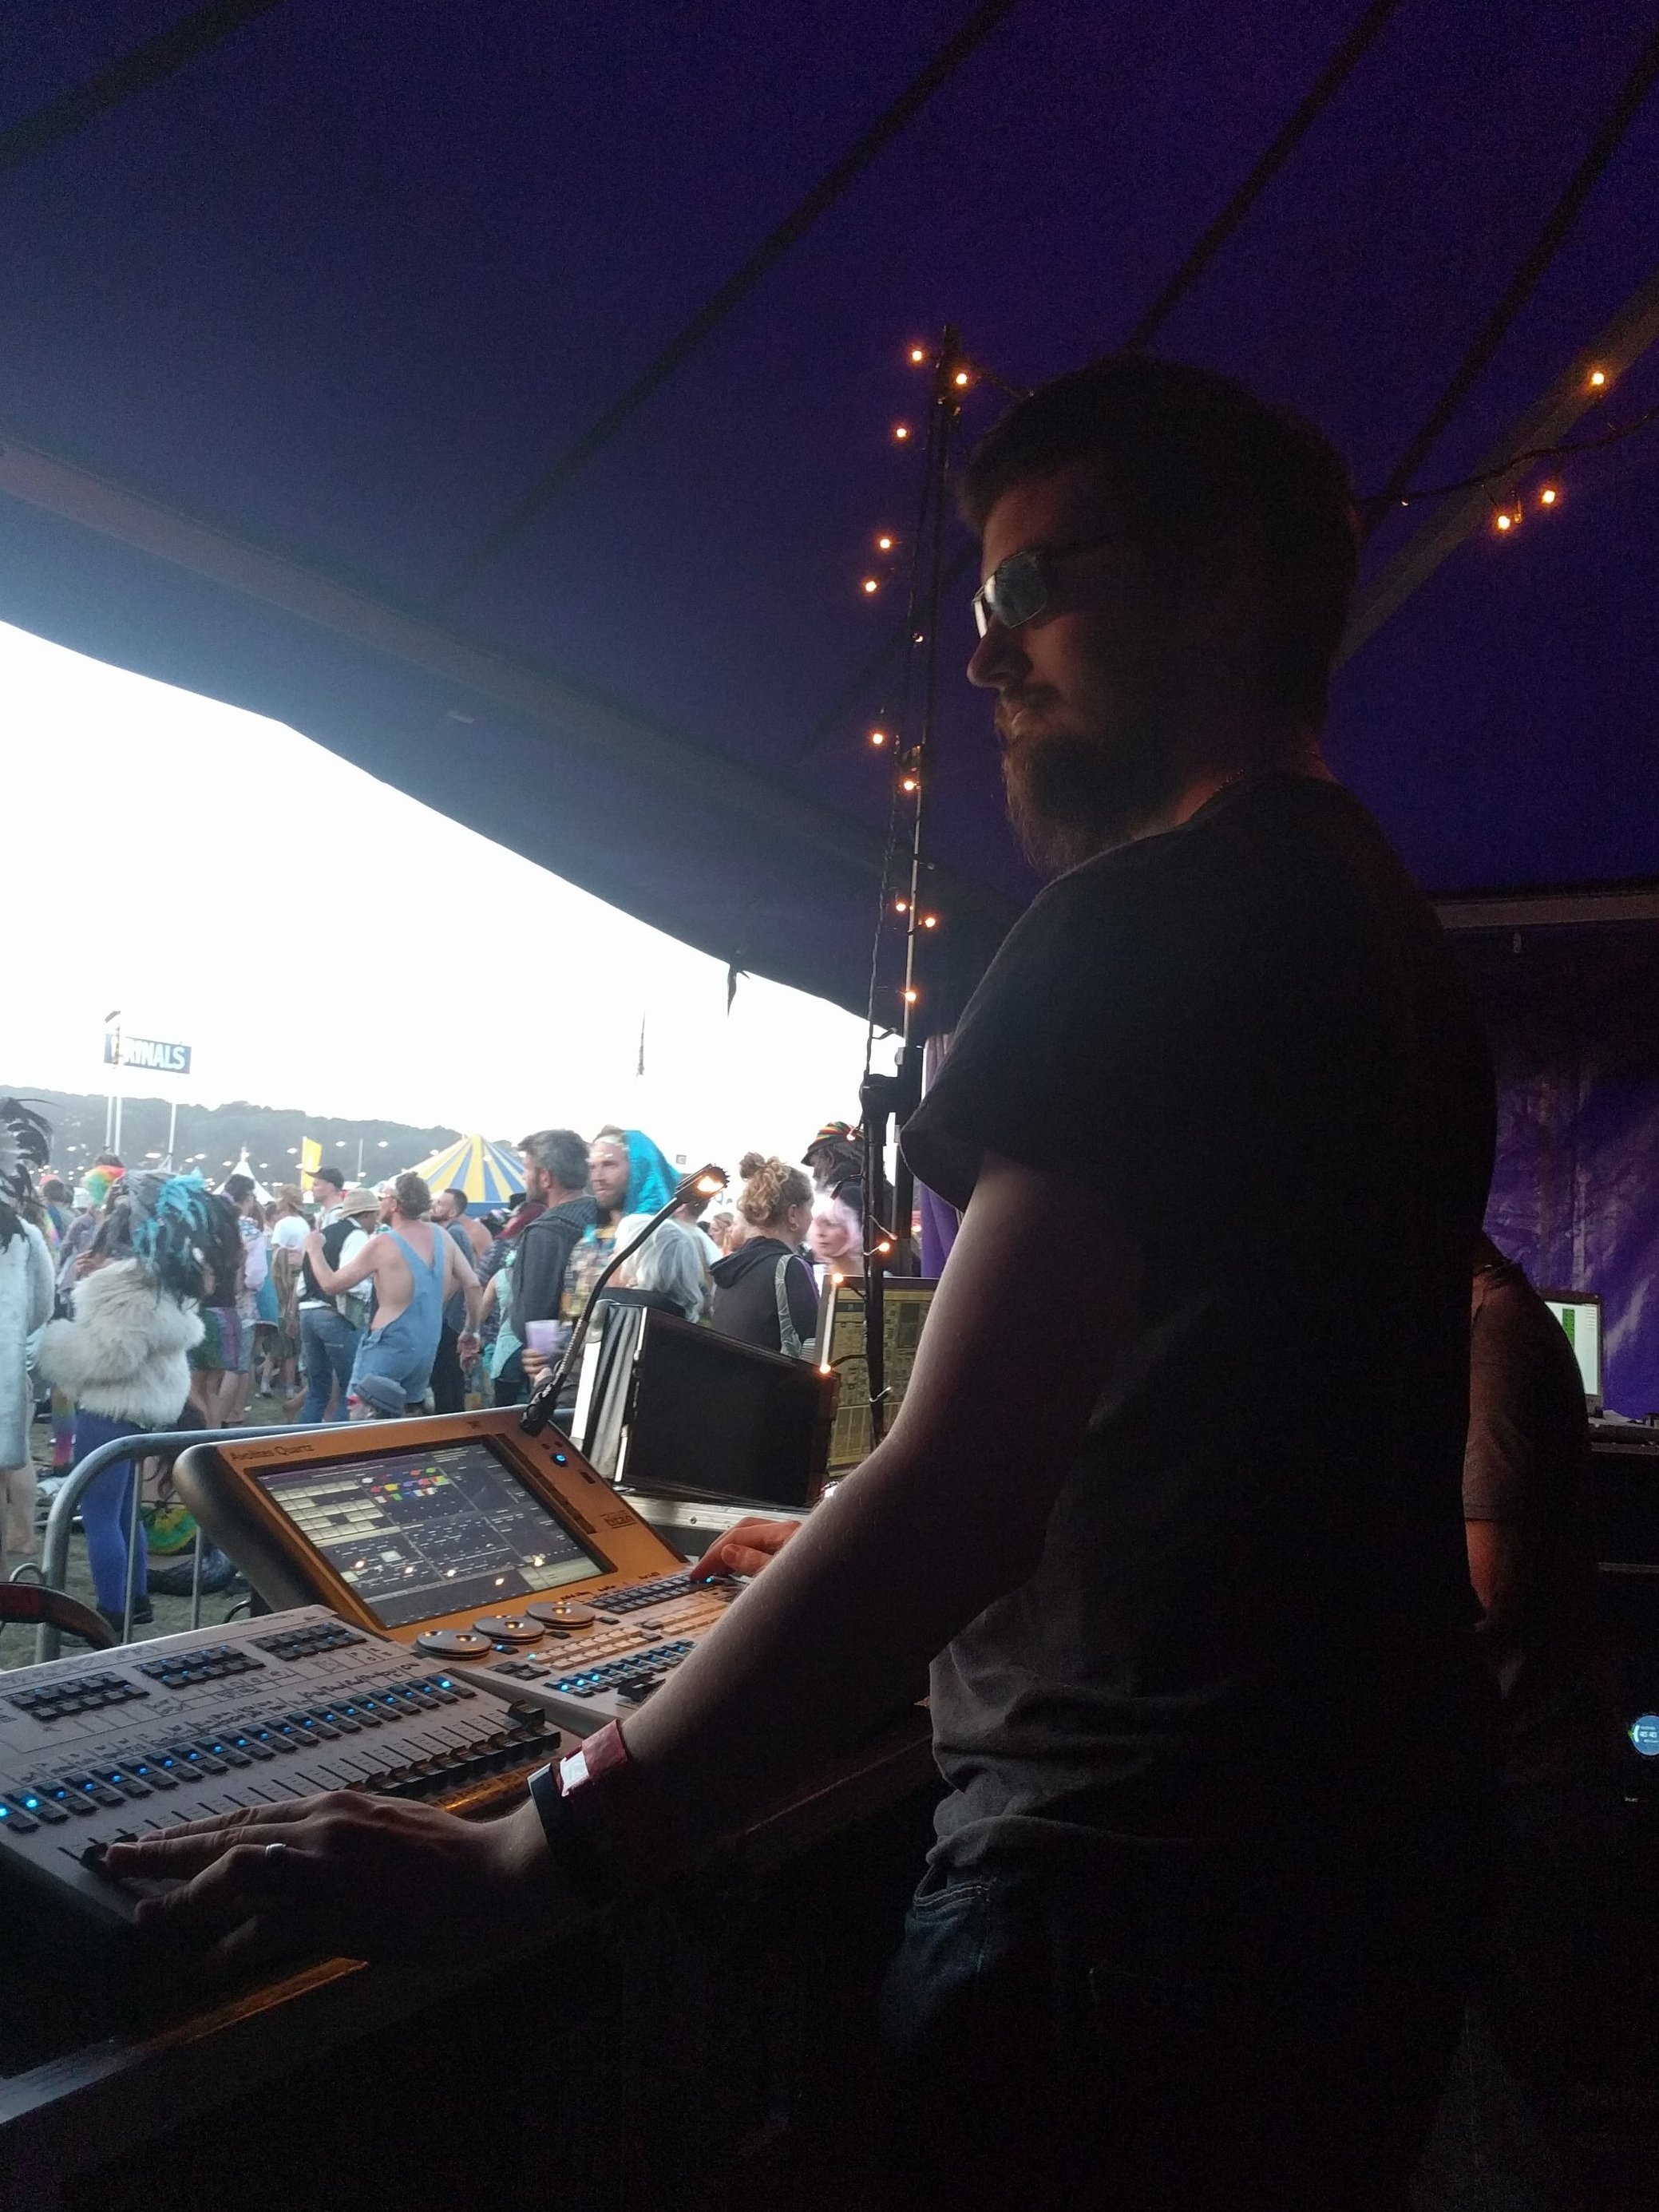 Robb operating lighting on the main stage at Shambala Festival 2017